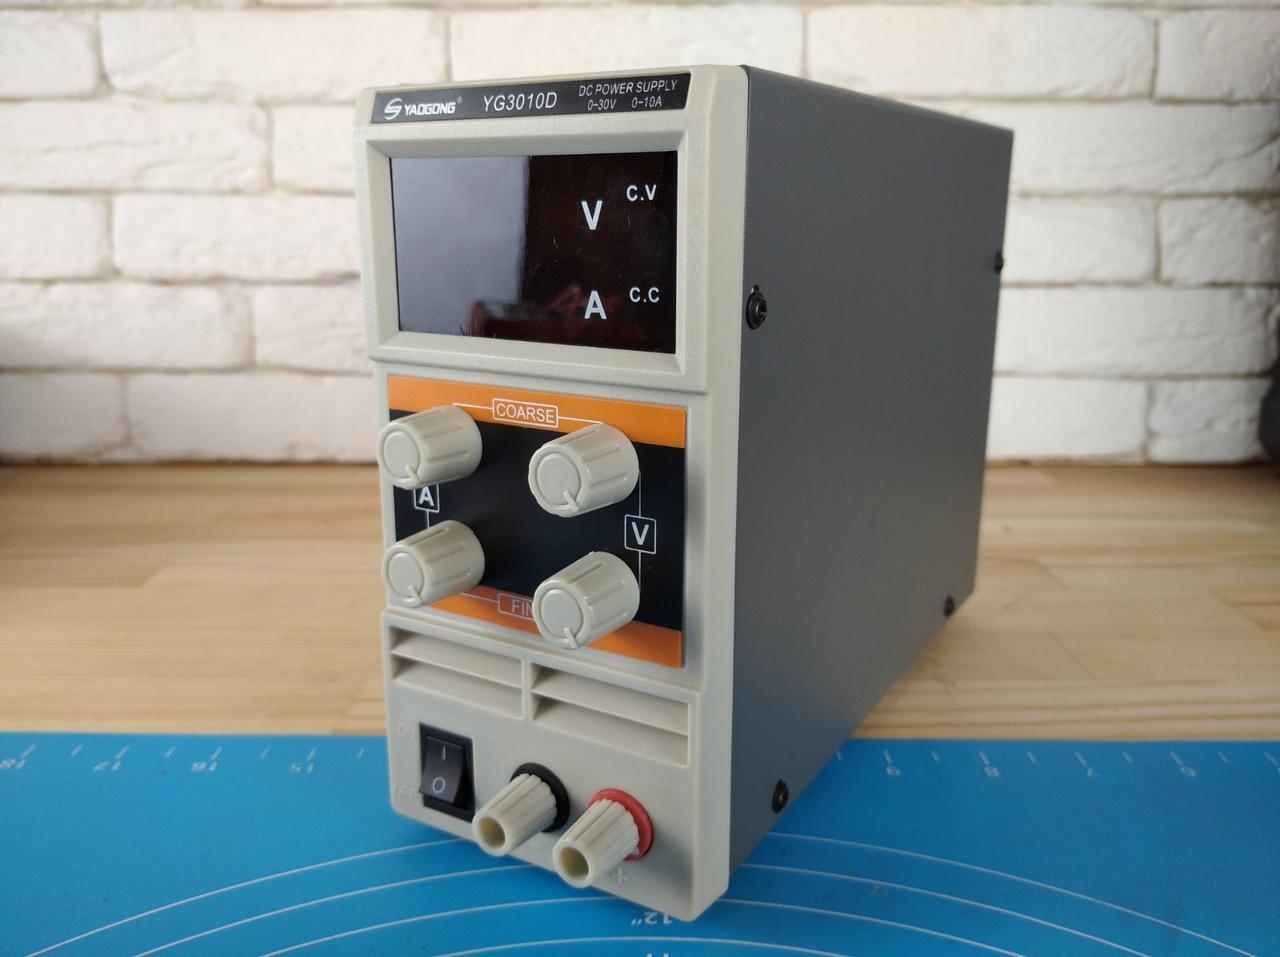 Лабораторный блок питания Yaogong YG-3010D 30 вольт! 10 Ампер!